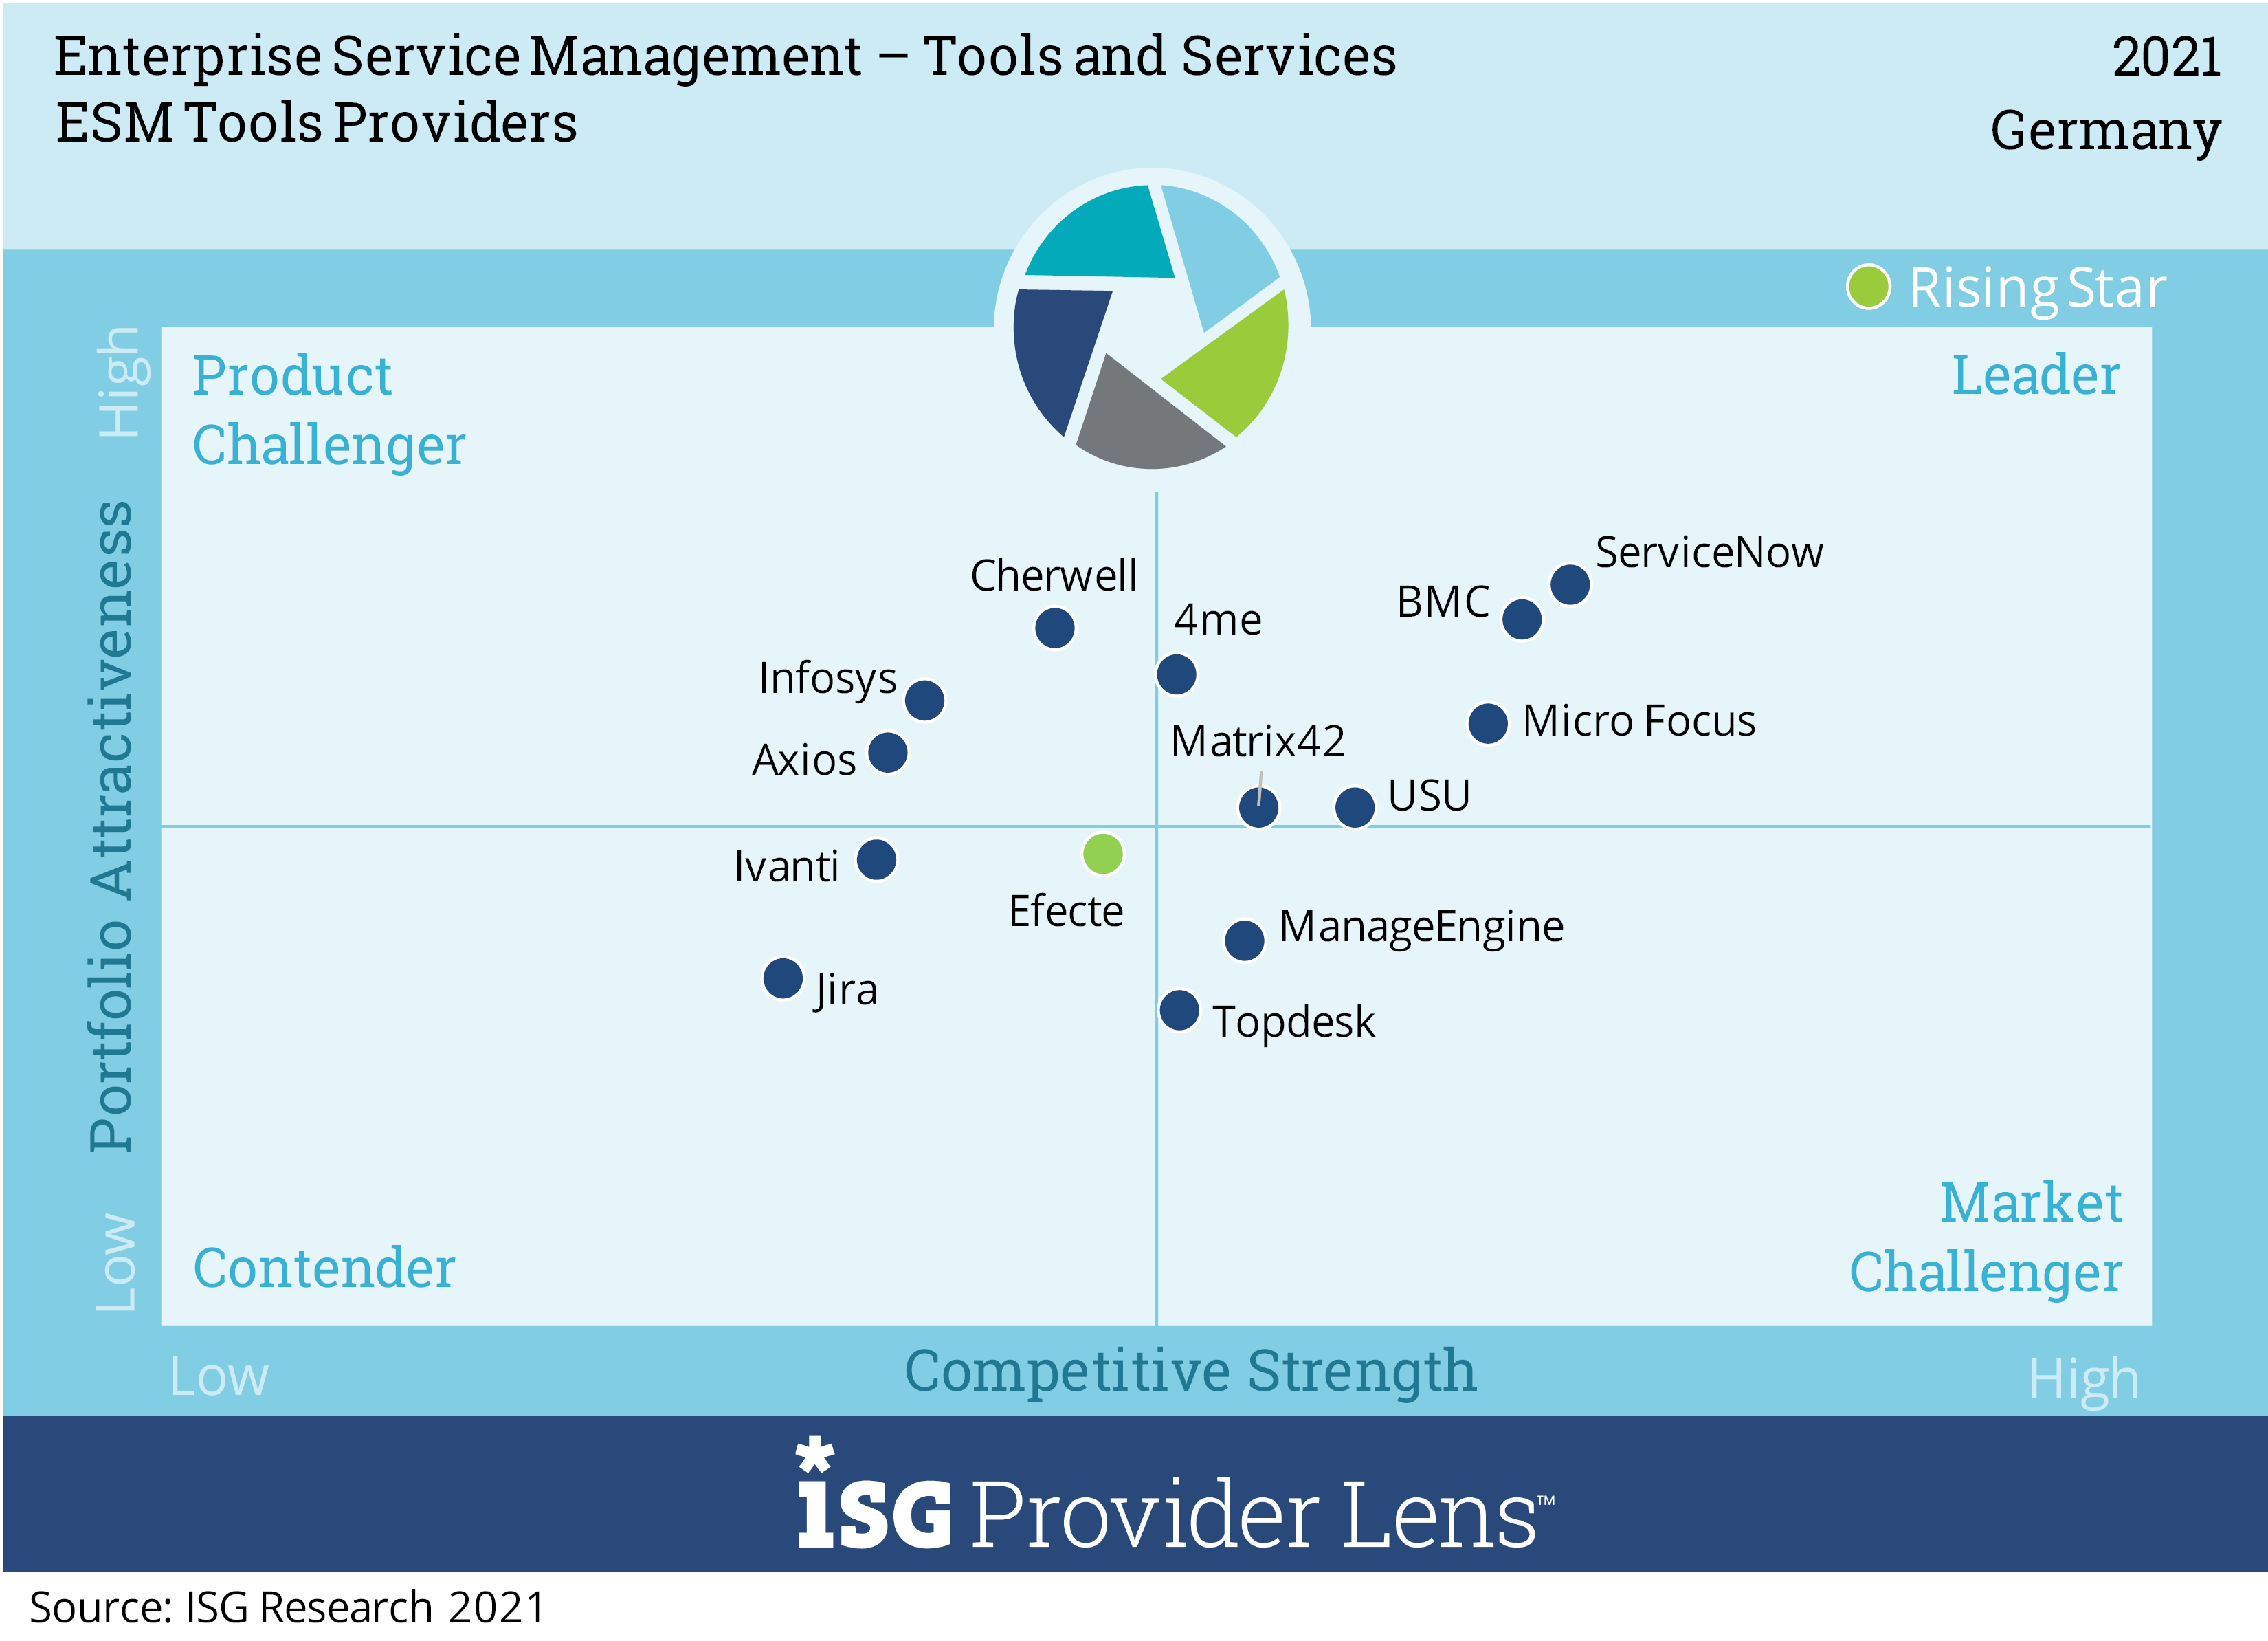 ISG ESM Tools Providers Quadrant